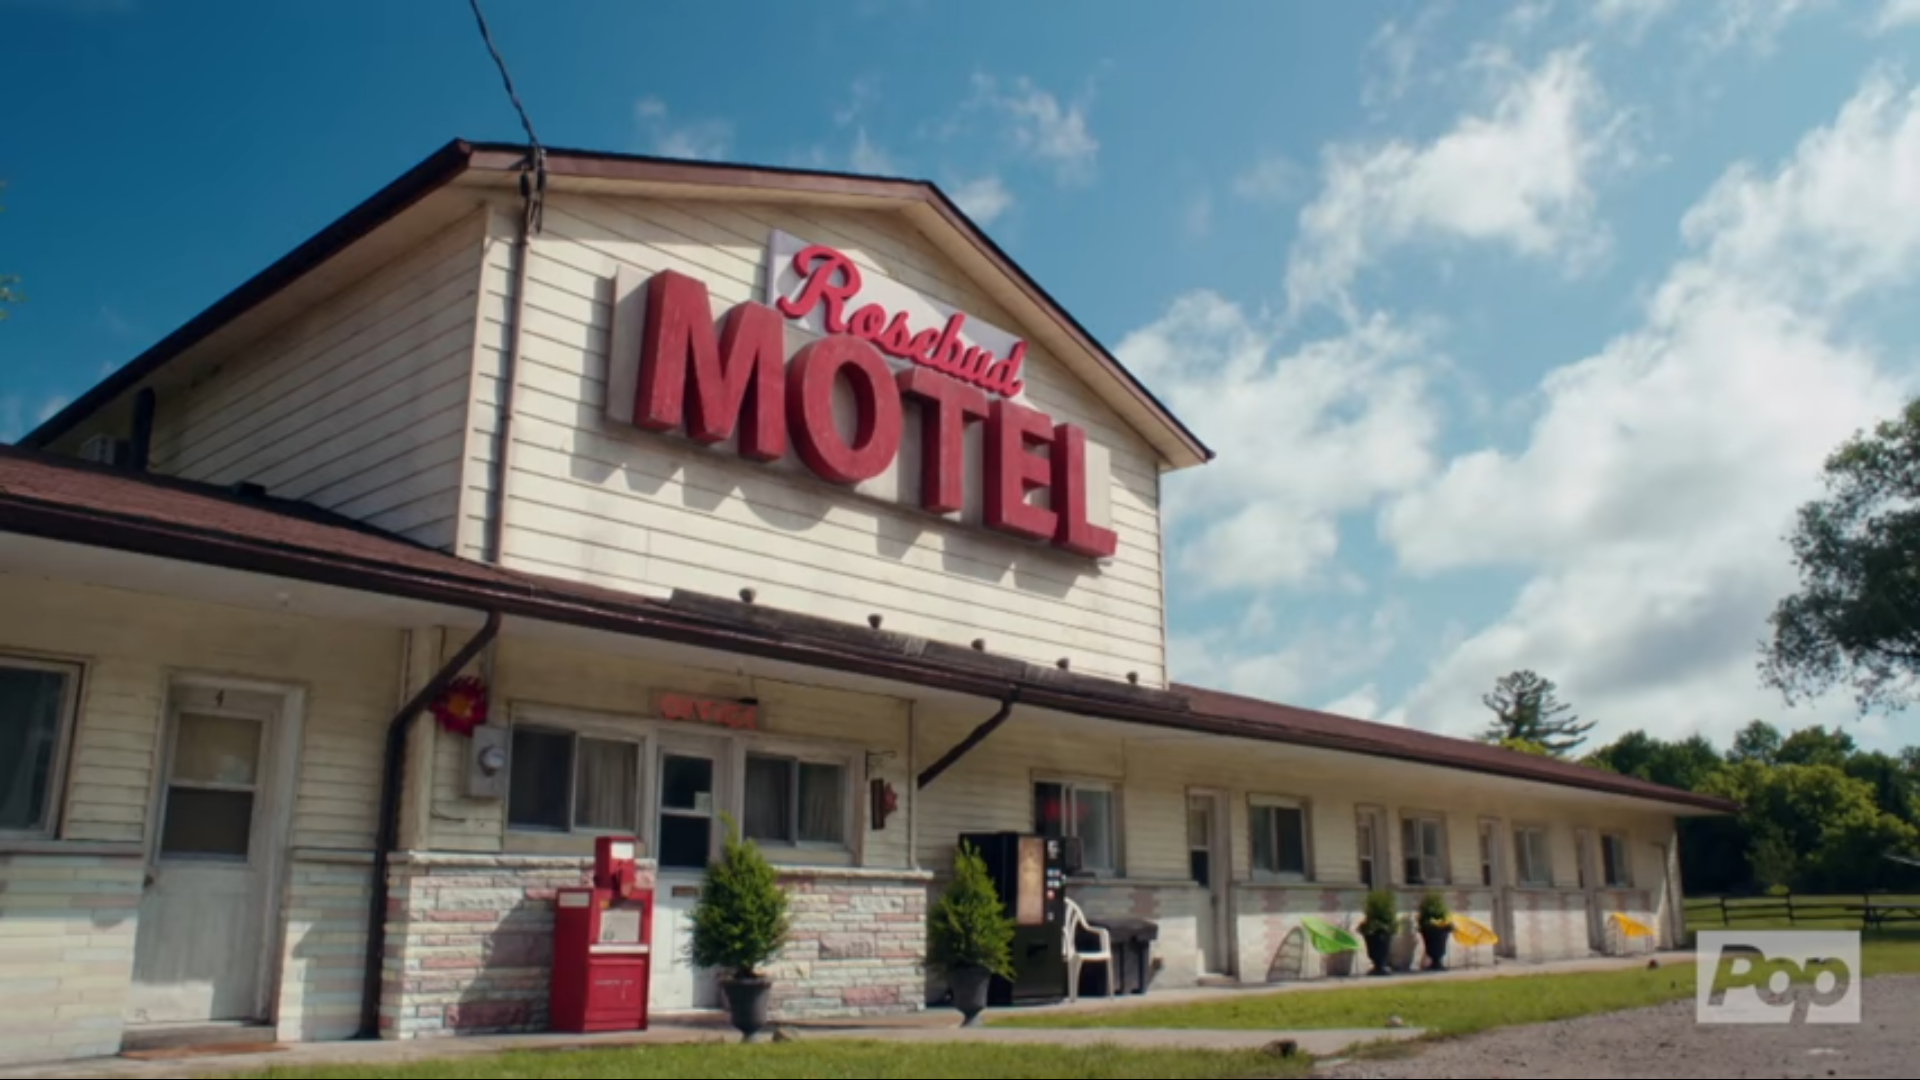 Rosebud Motel Schitt S Creek Wiki Fandom Powered By Wikia